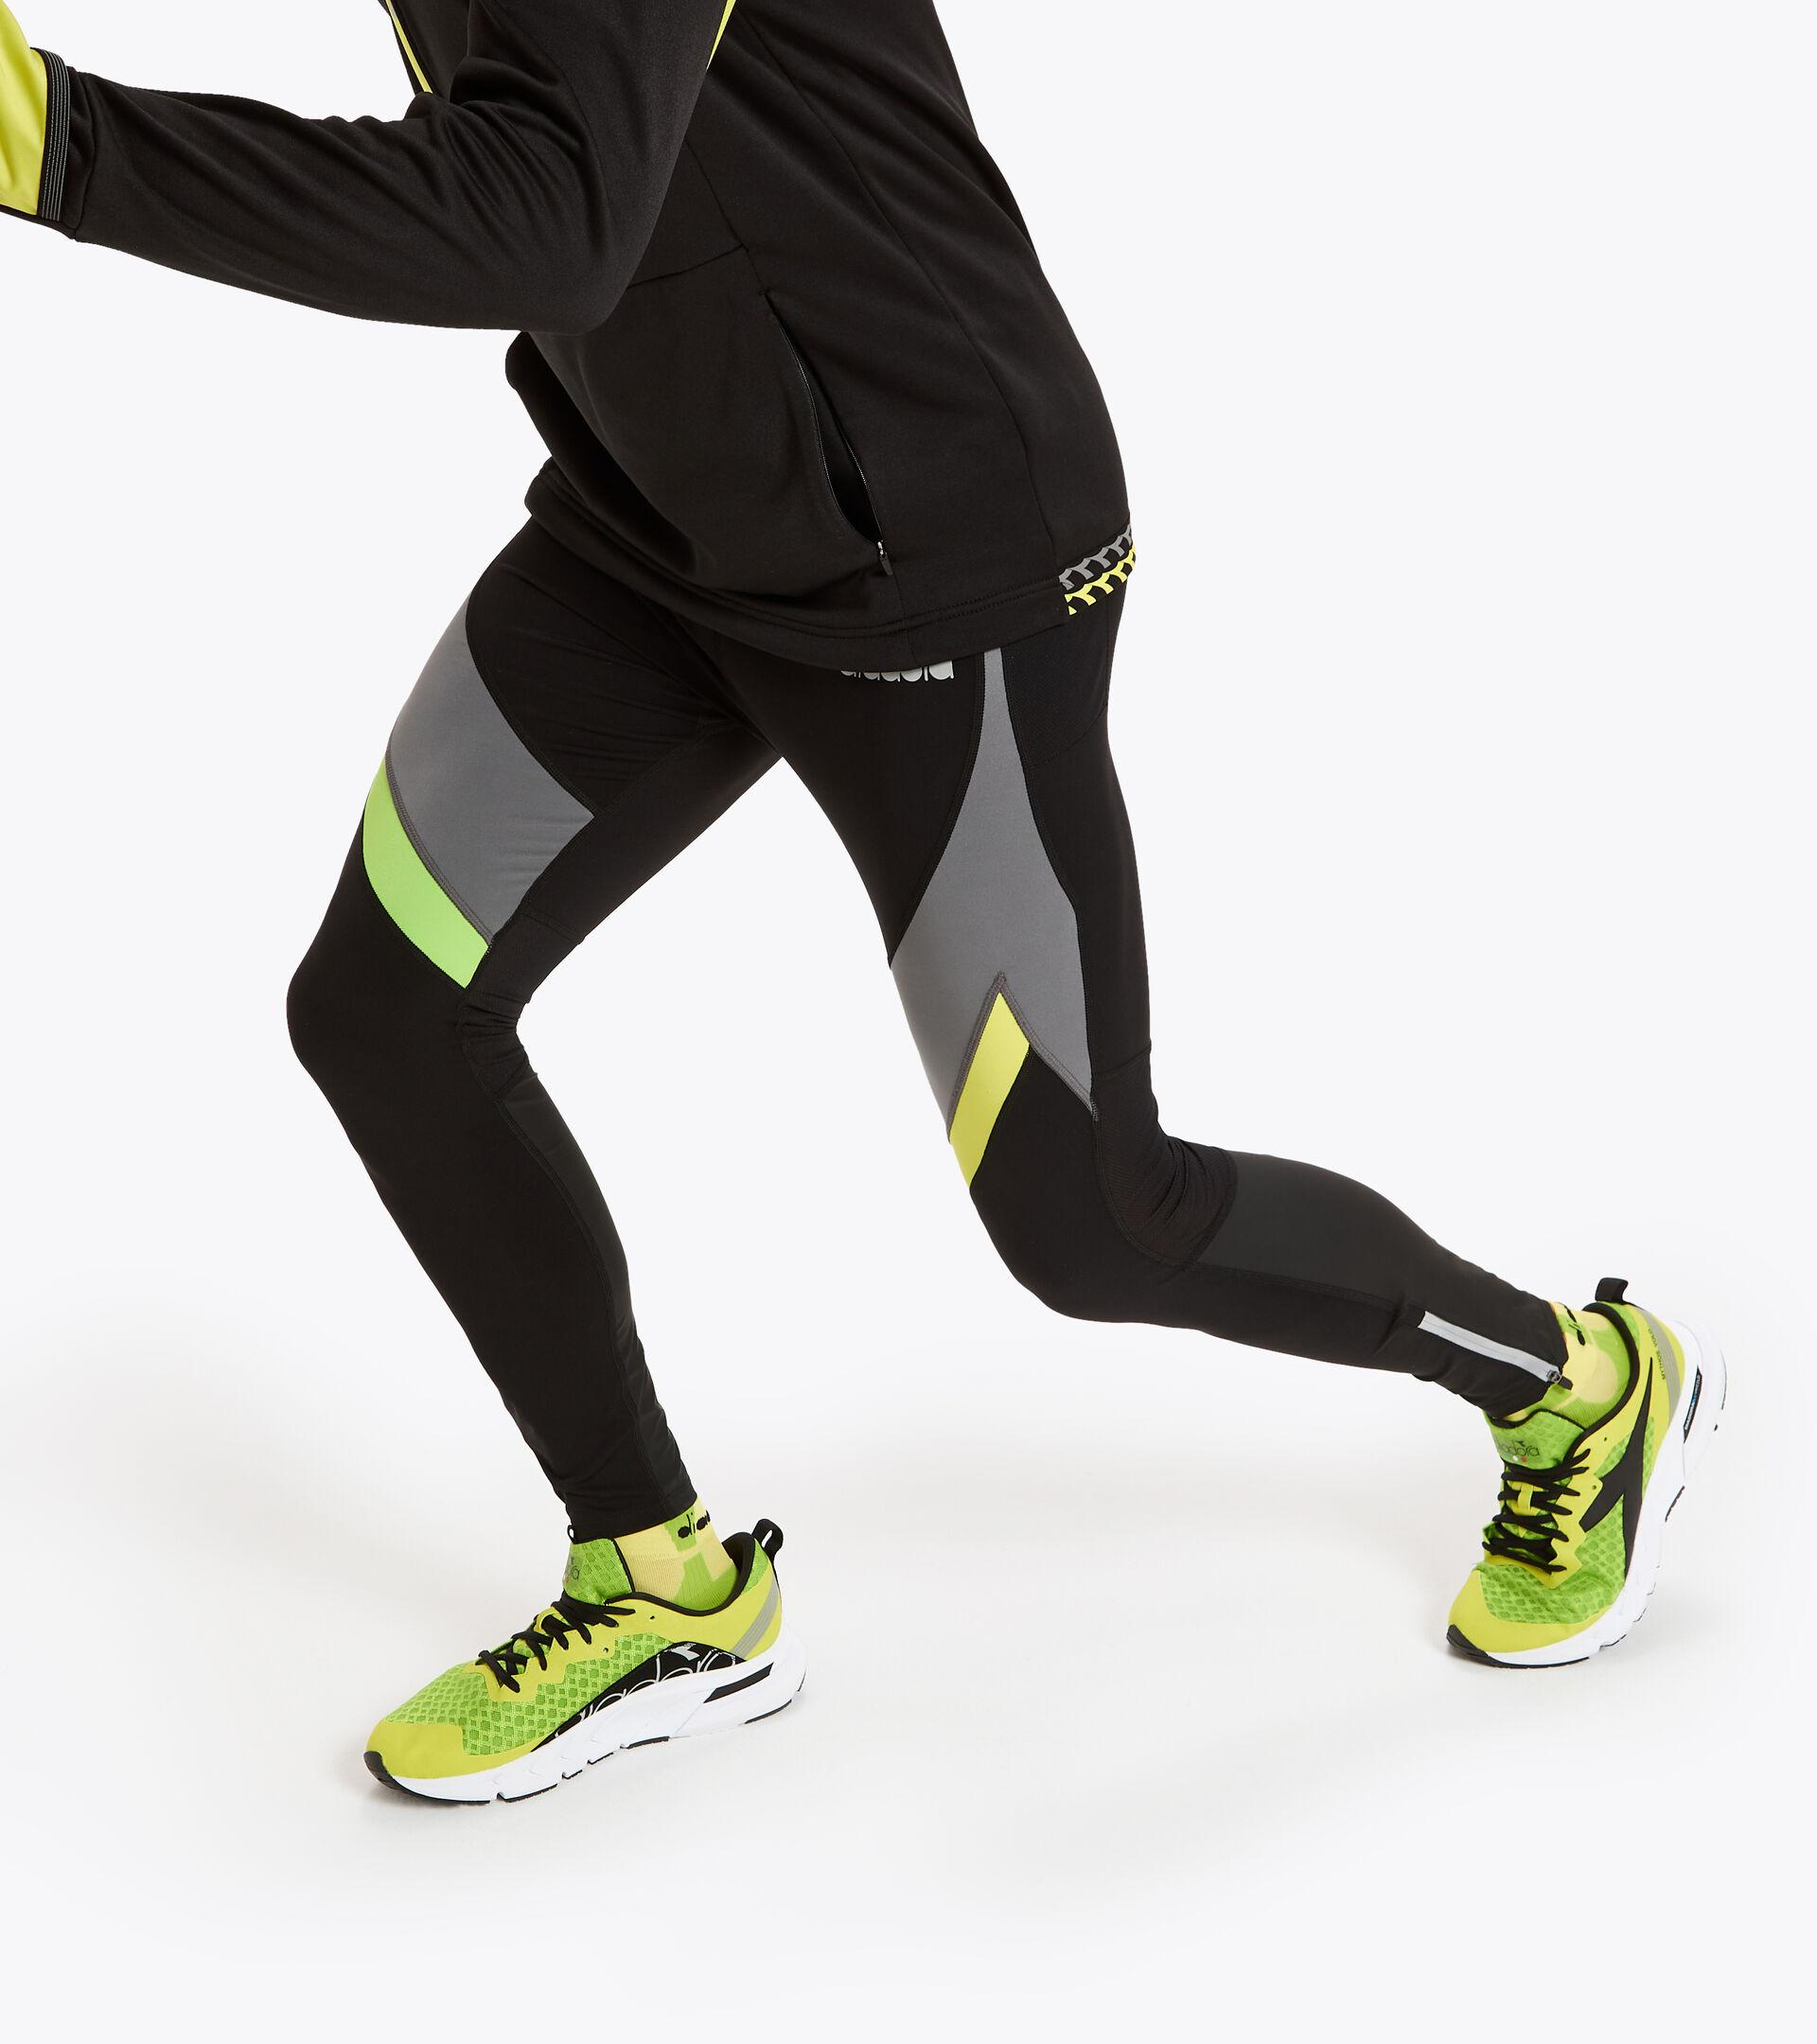 Apparel Sport UOMO WINTER RUNNING TIGHTS NERO Diadora